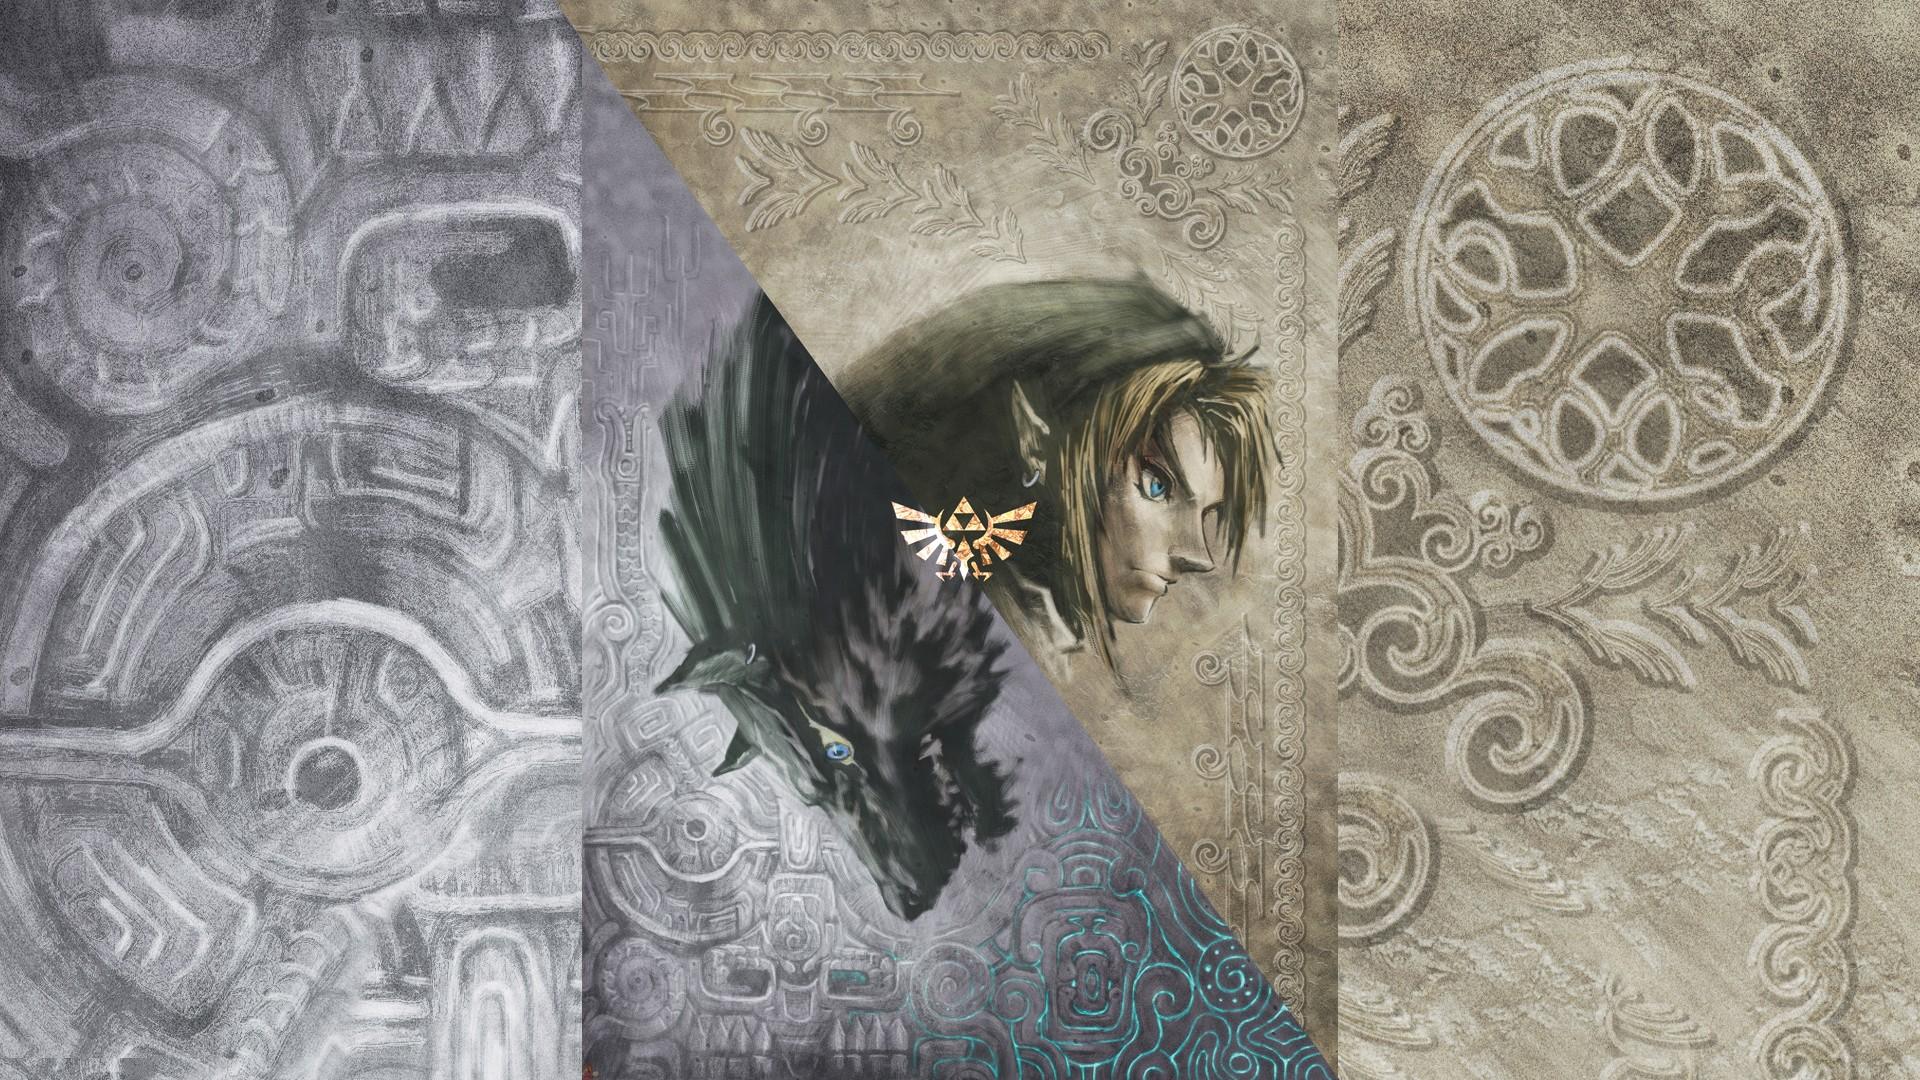 General 1920x1080 The Legend of Zelda video games The Legend of Zelda: Twilight Princess Link Wolf Link video game art